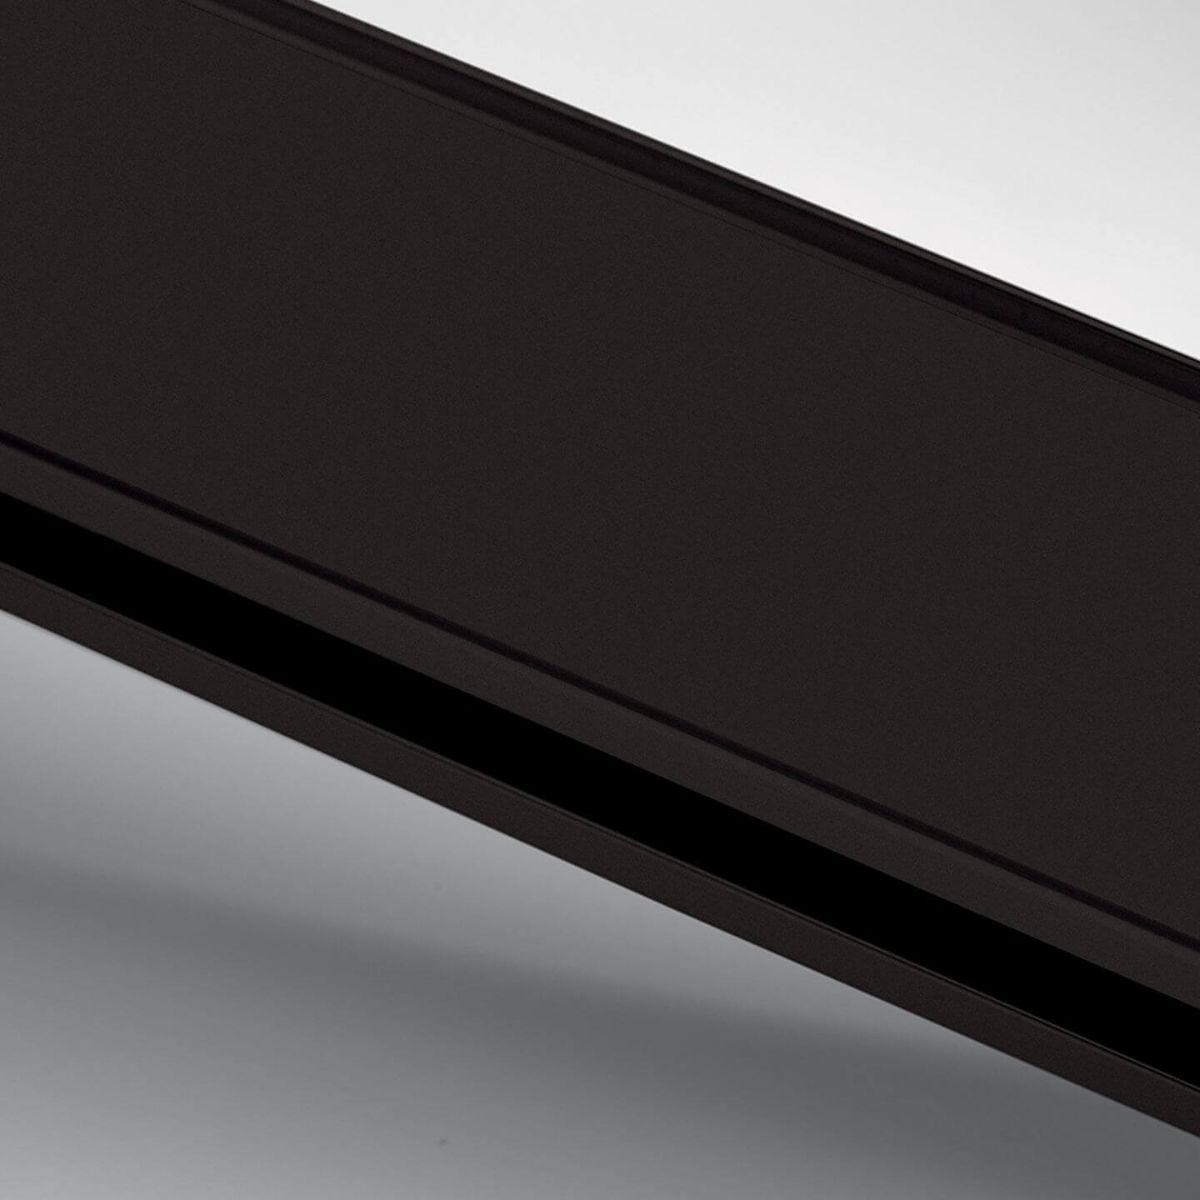 Dark brown anodized aluminium finish for glass walls